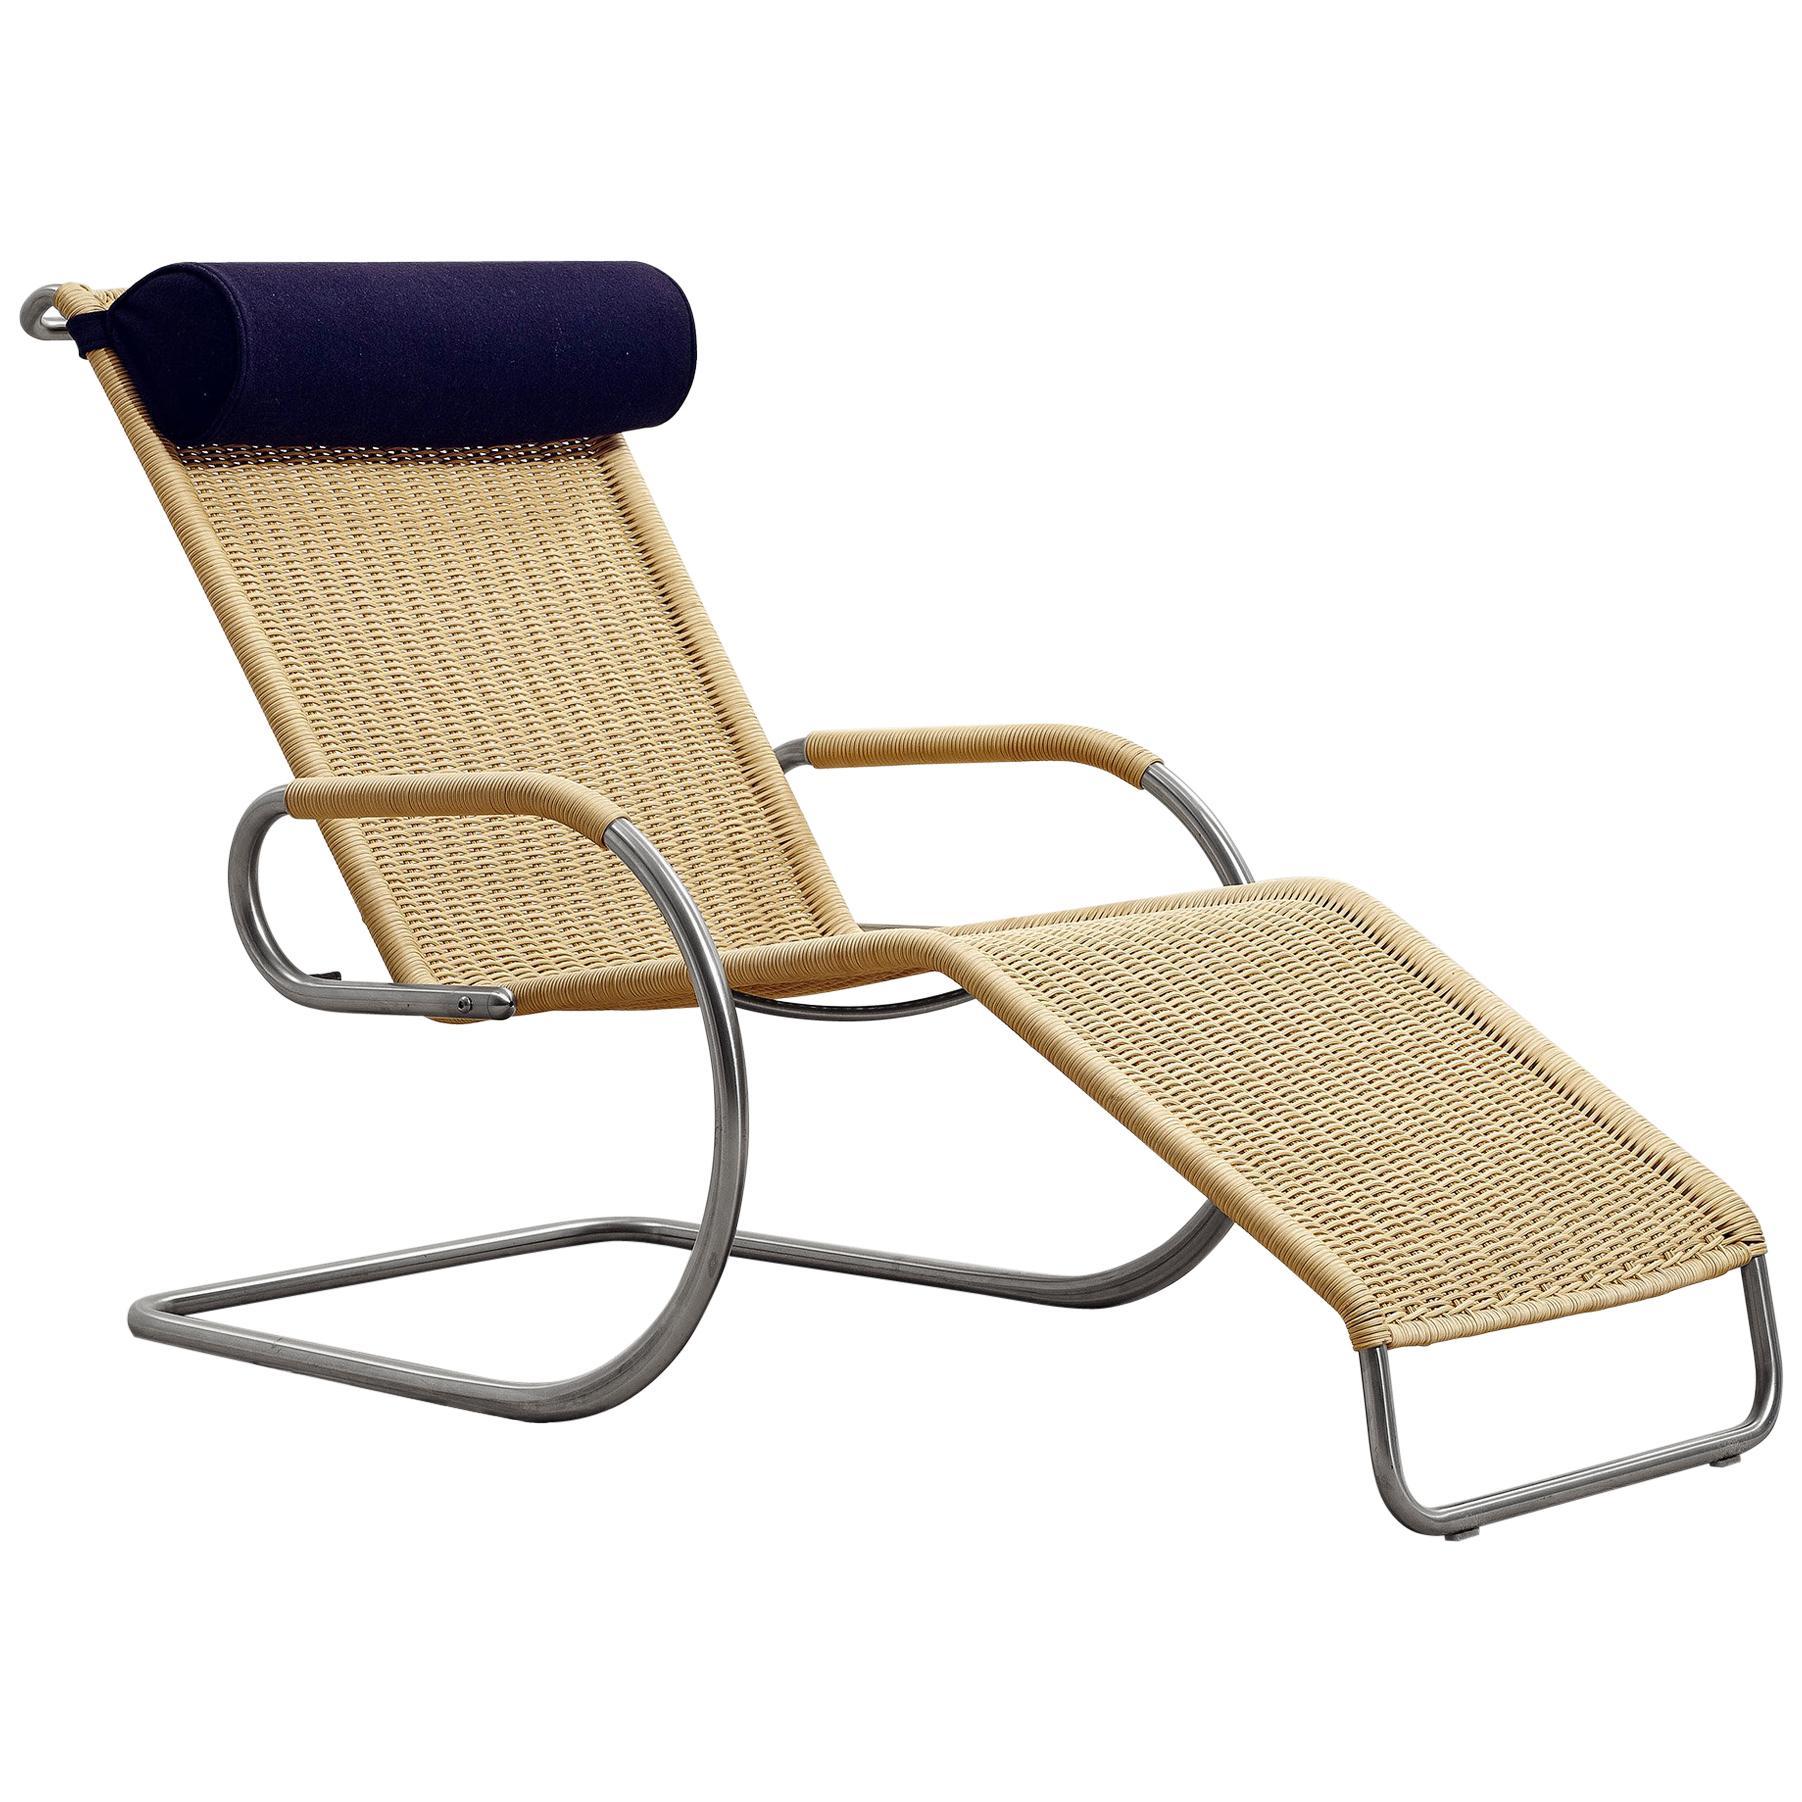 Bon Wicker Chaise Longue U0027F42 1Eu0027 By Mies Van Der Rohe, Designed In